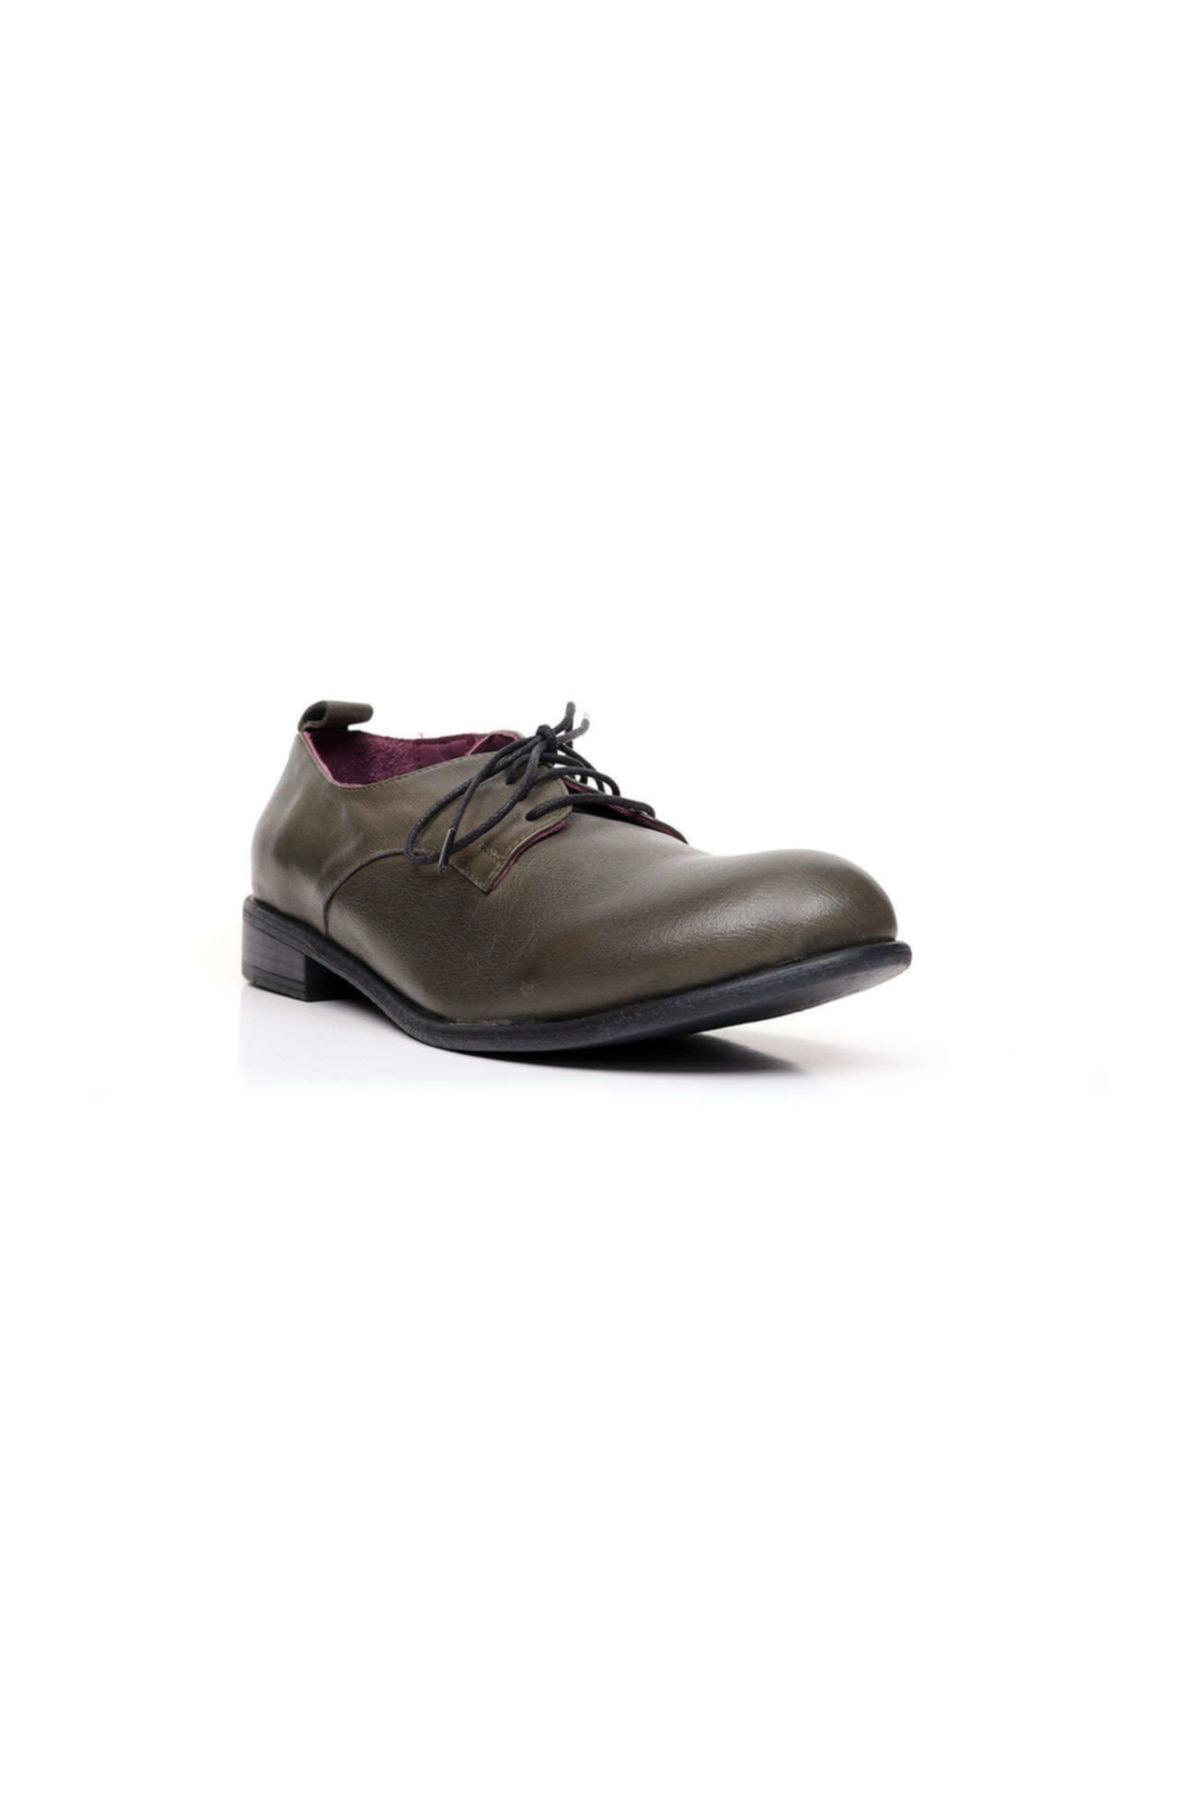 BUENO Shoes  Kadın Ayakkabı 9p1704 1